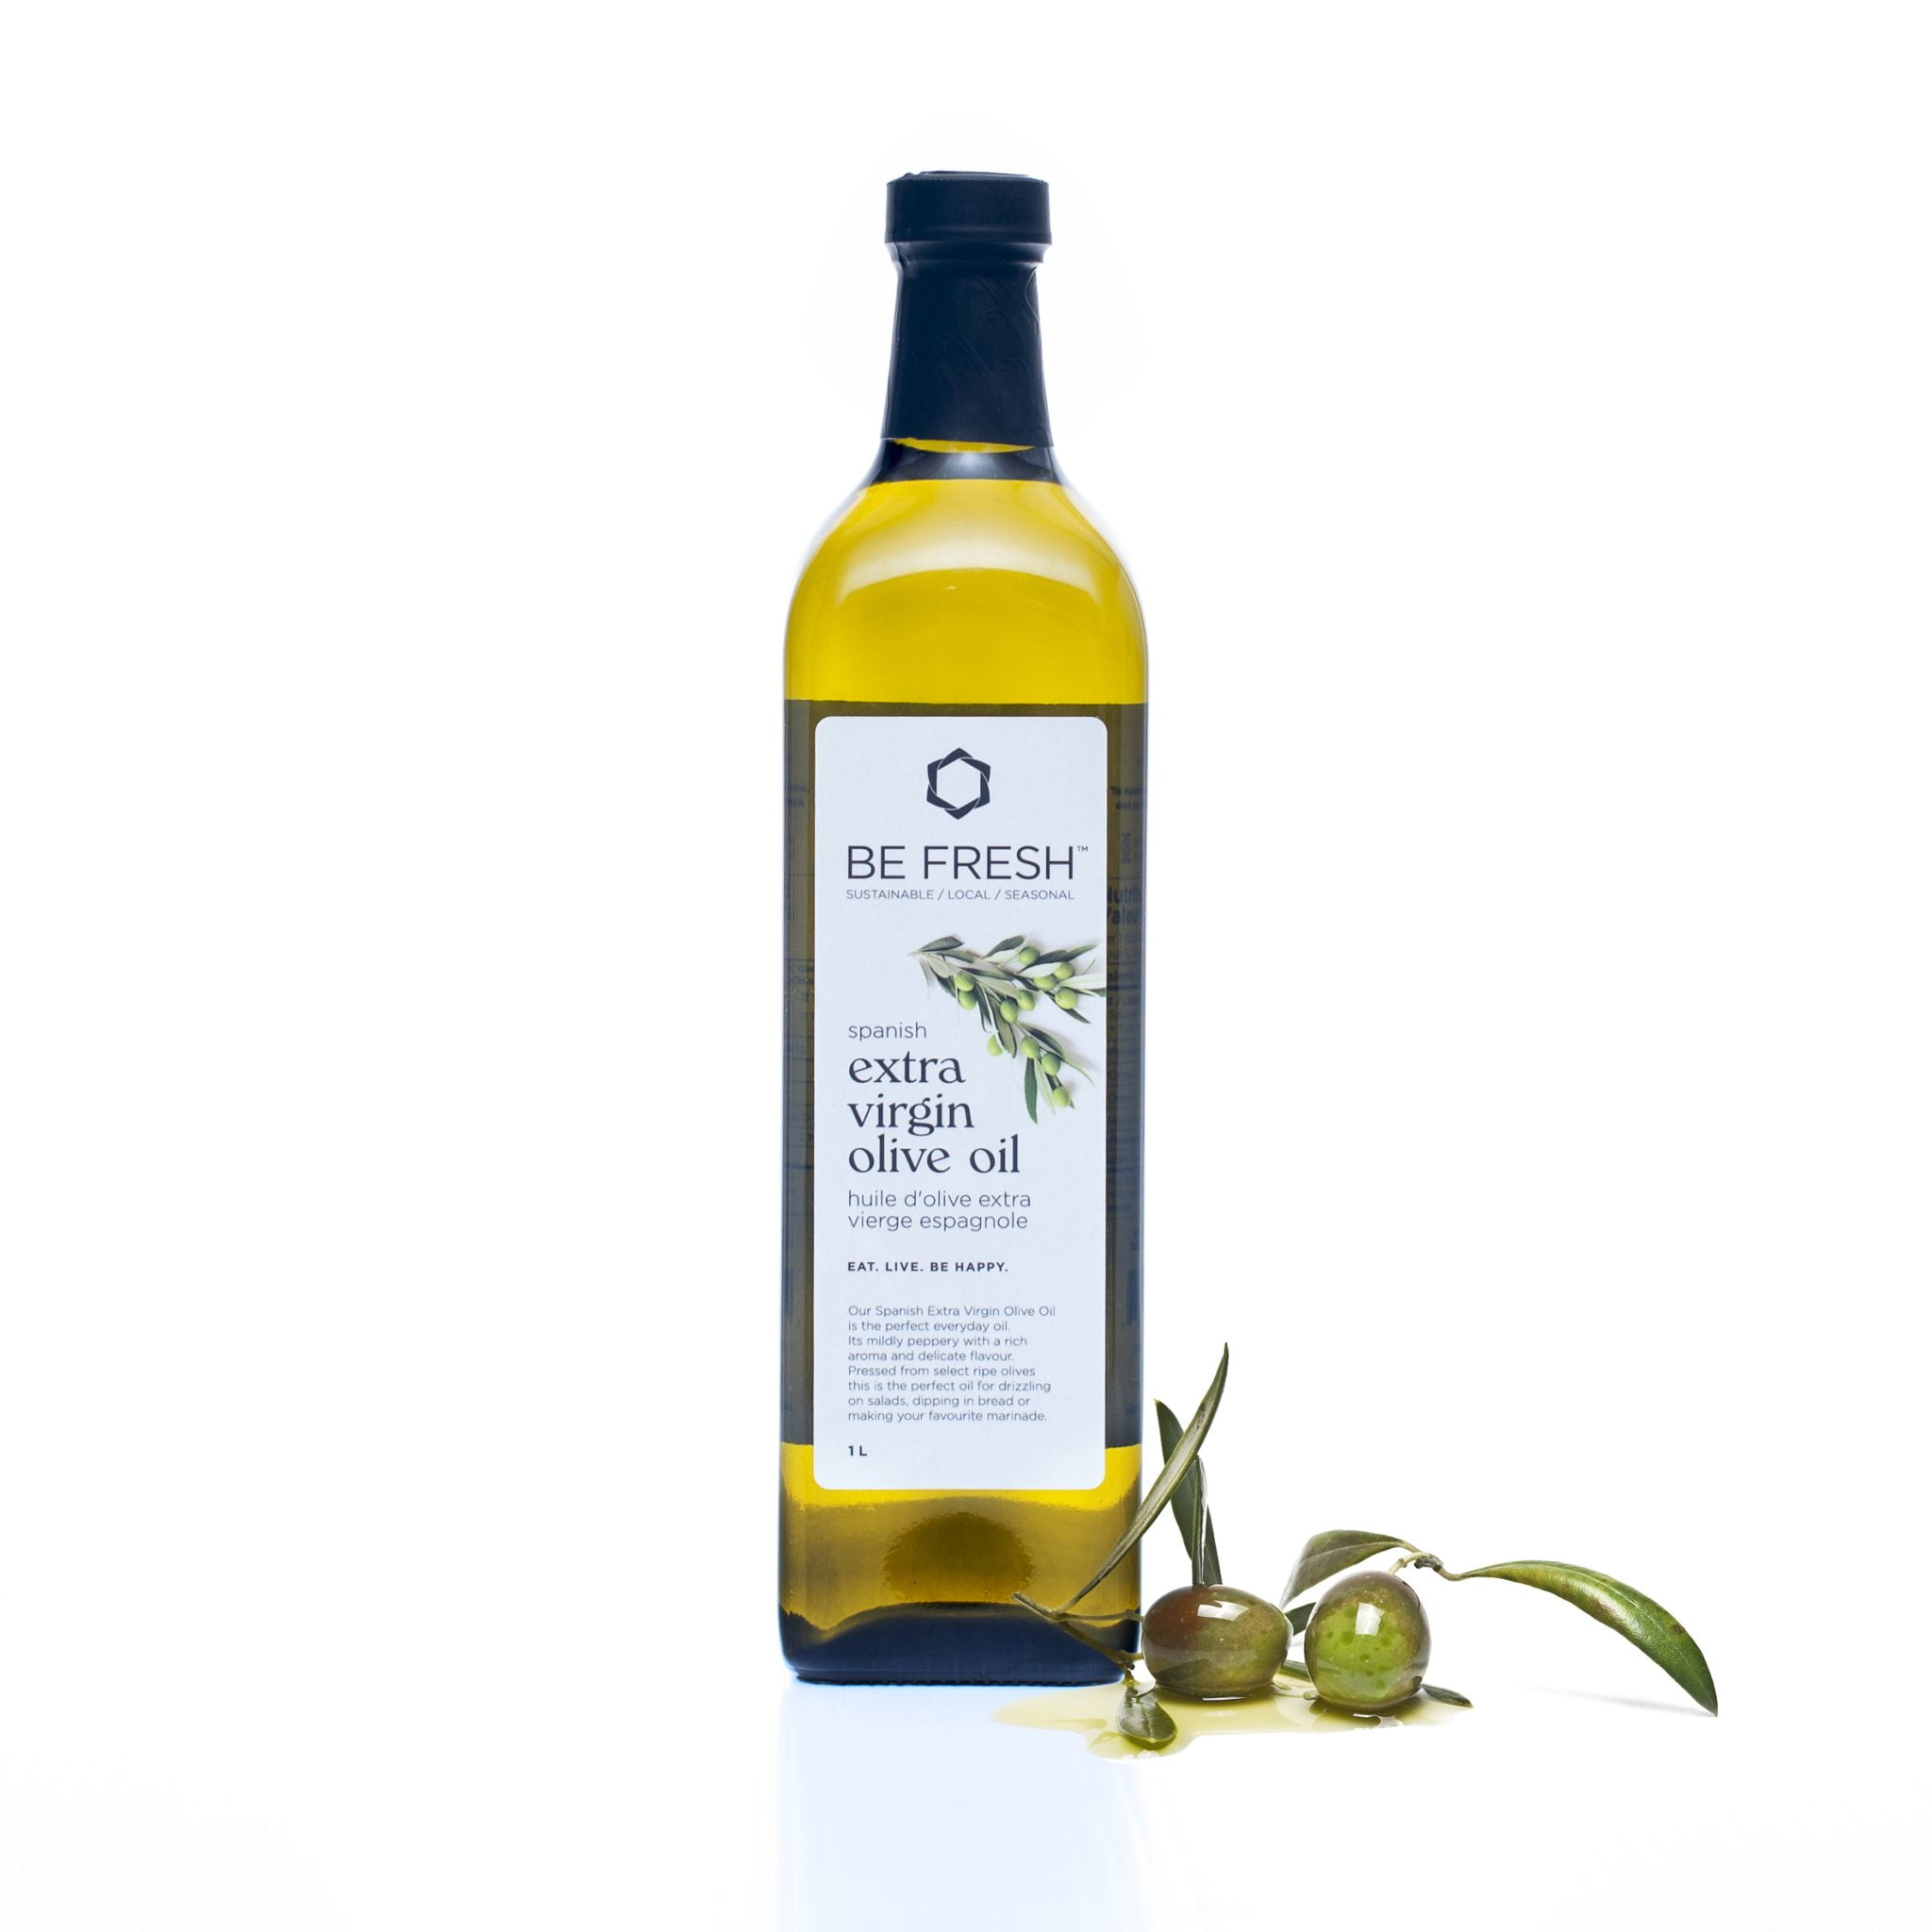 Be Fresh Olive Oil